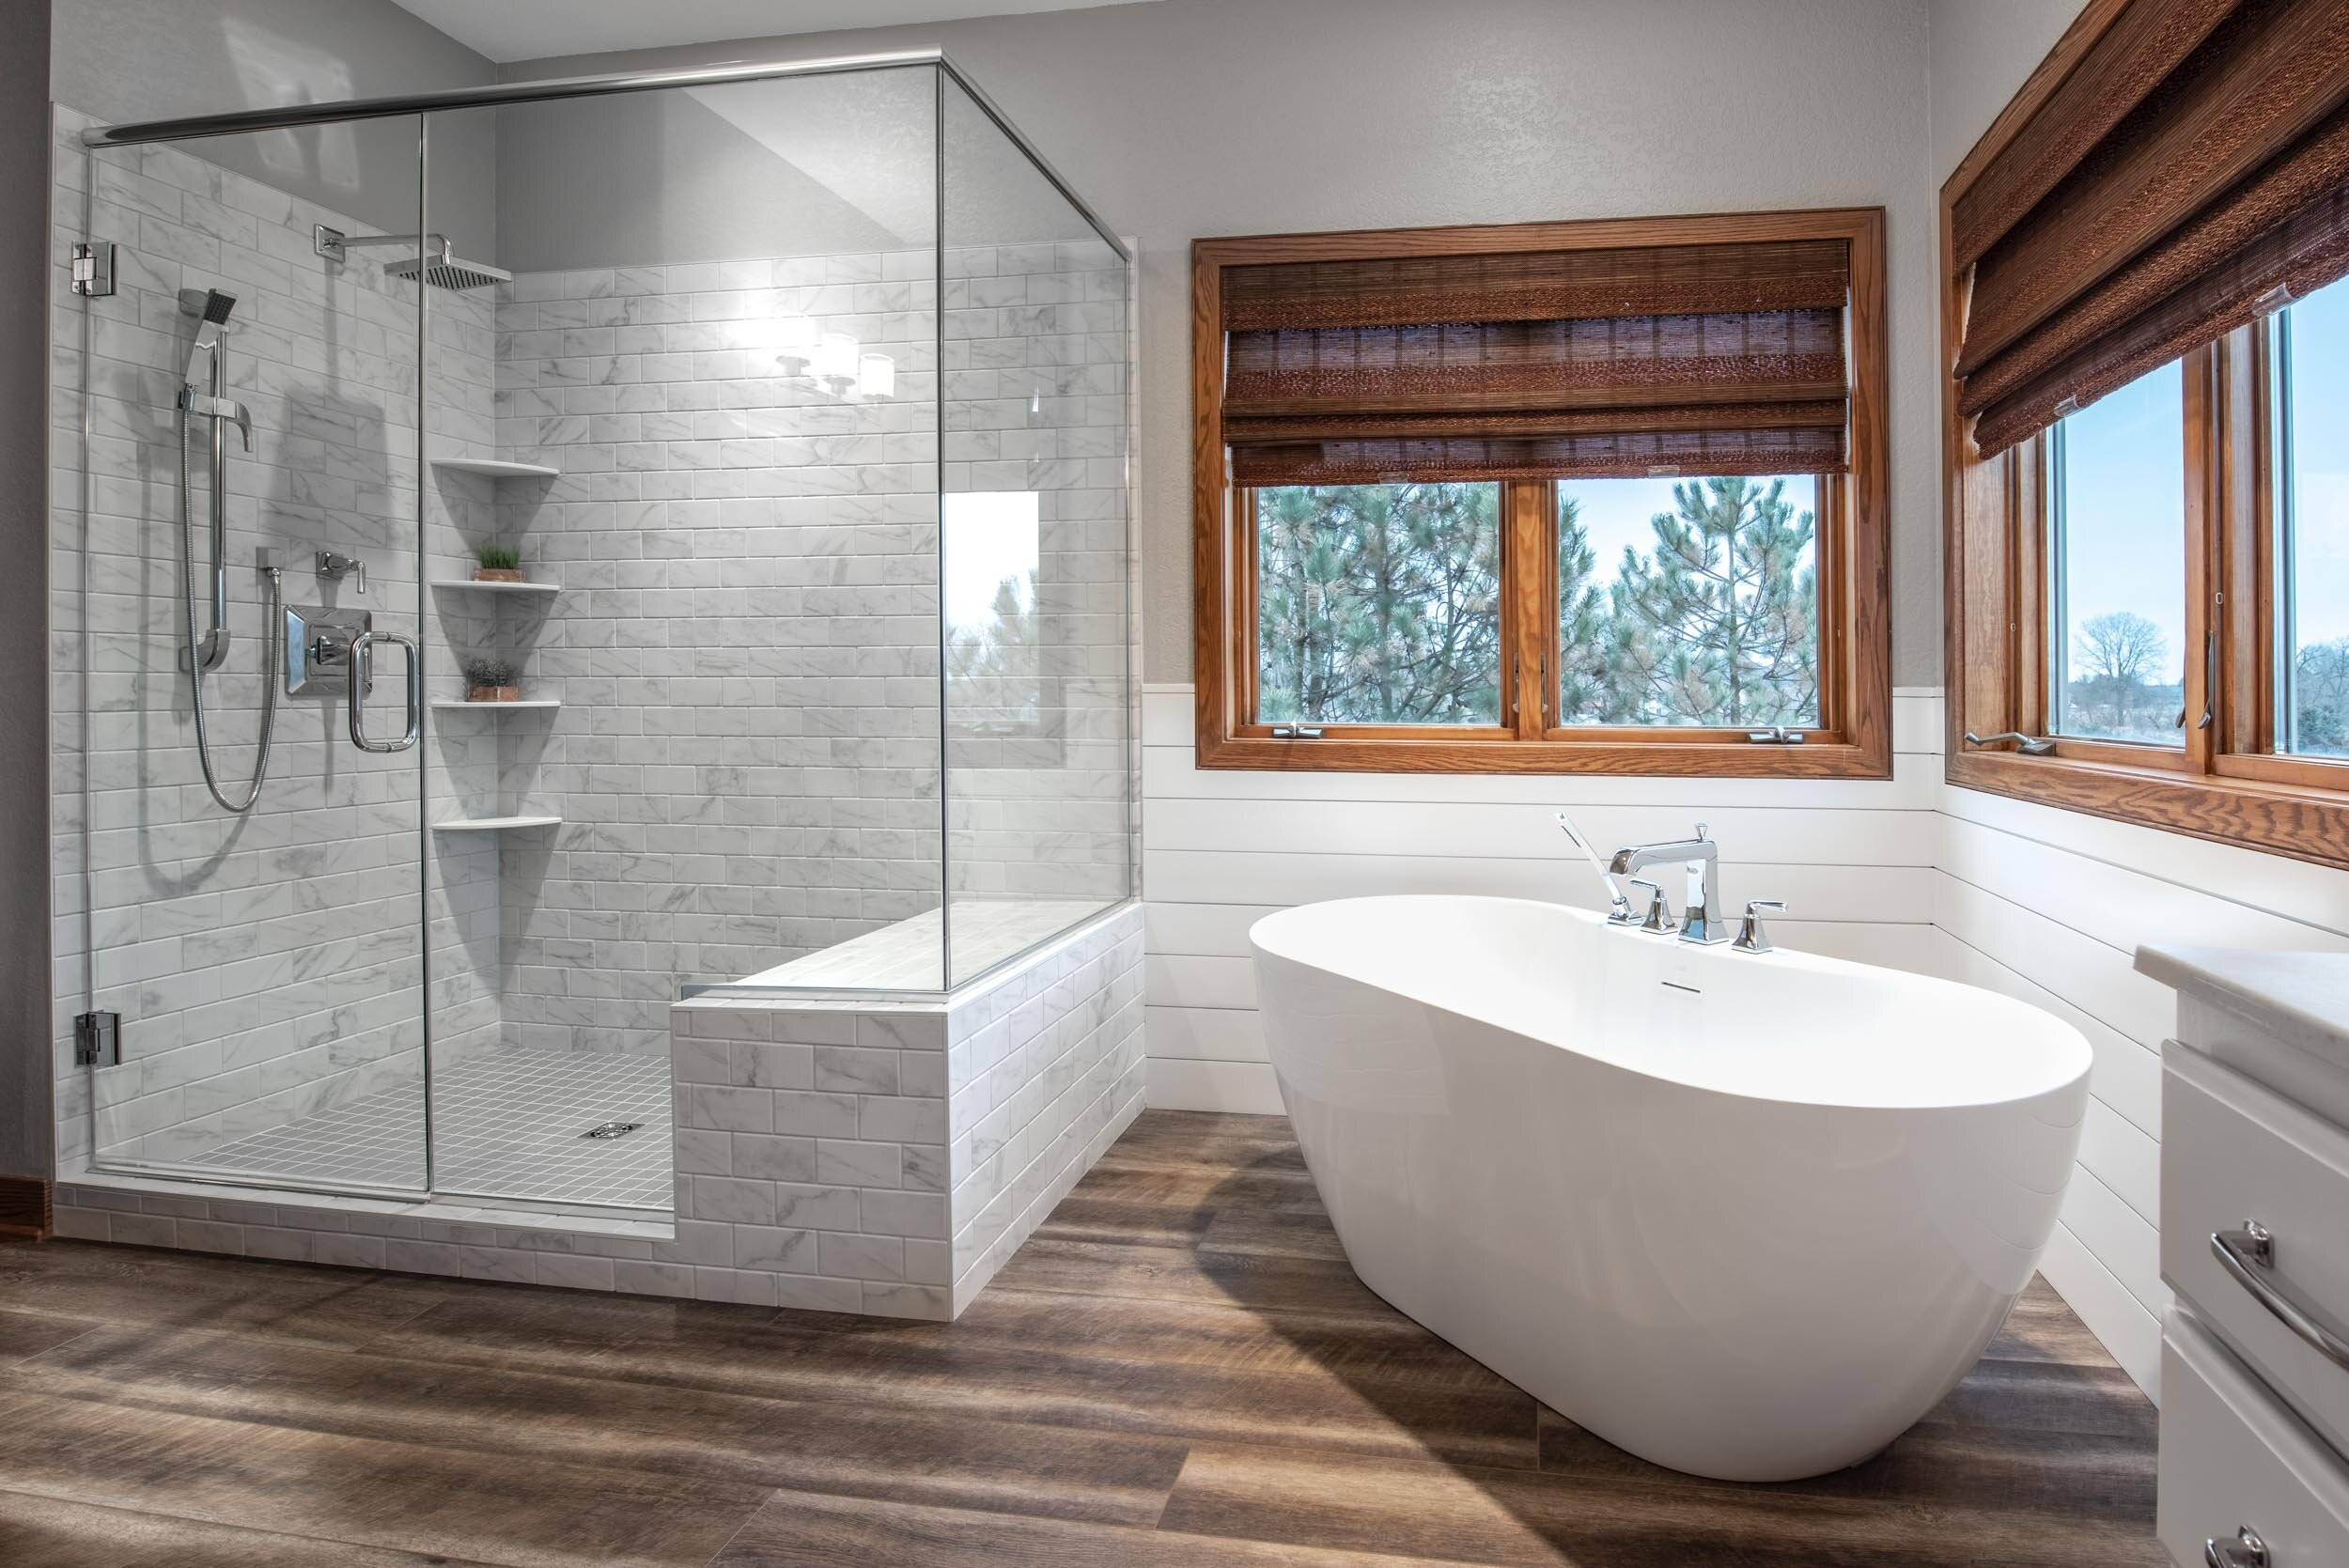 how to choose a bathtub material